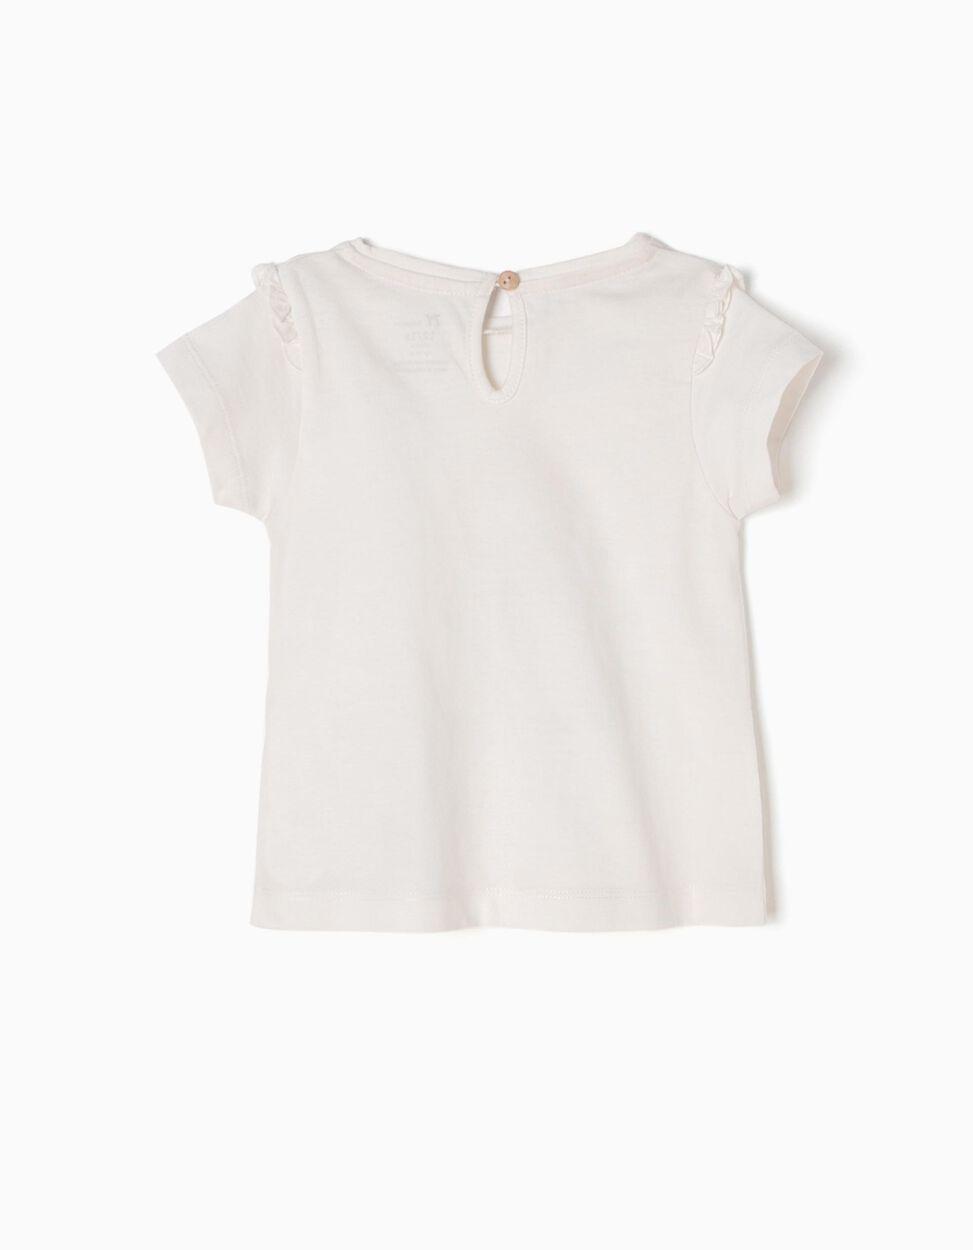 T-shirt Branca Sweet Gardener